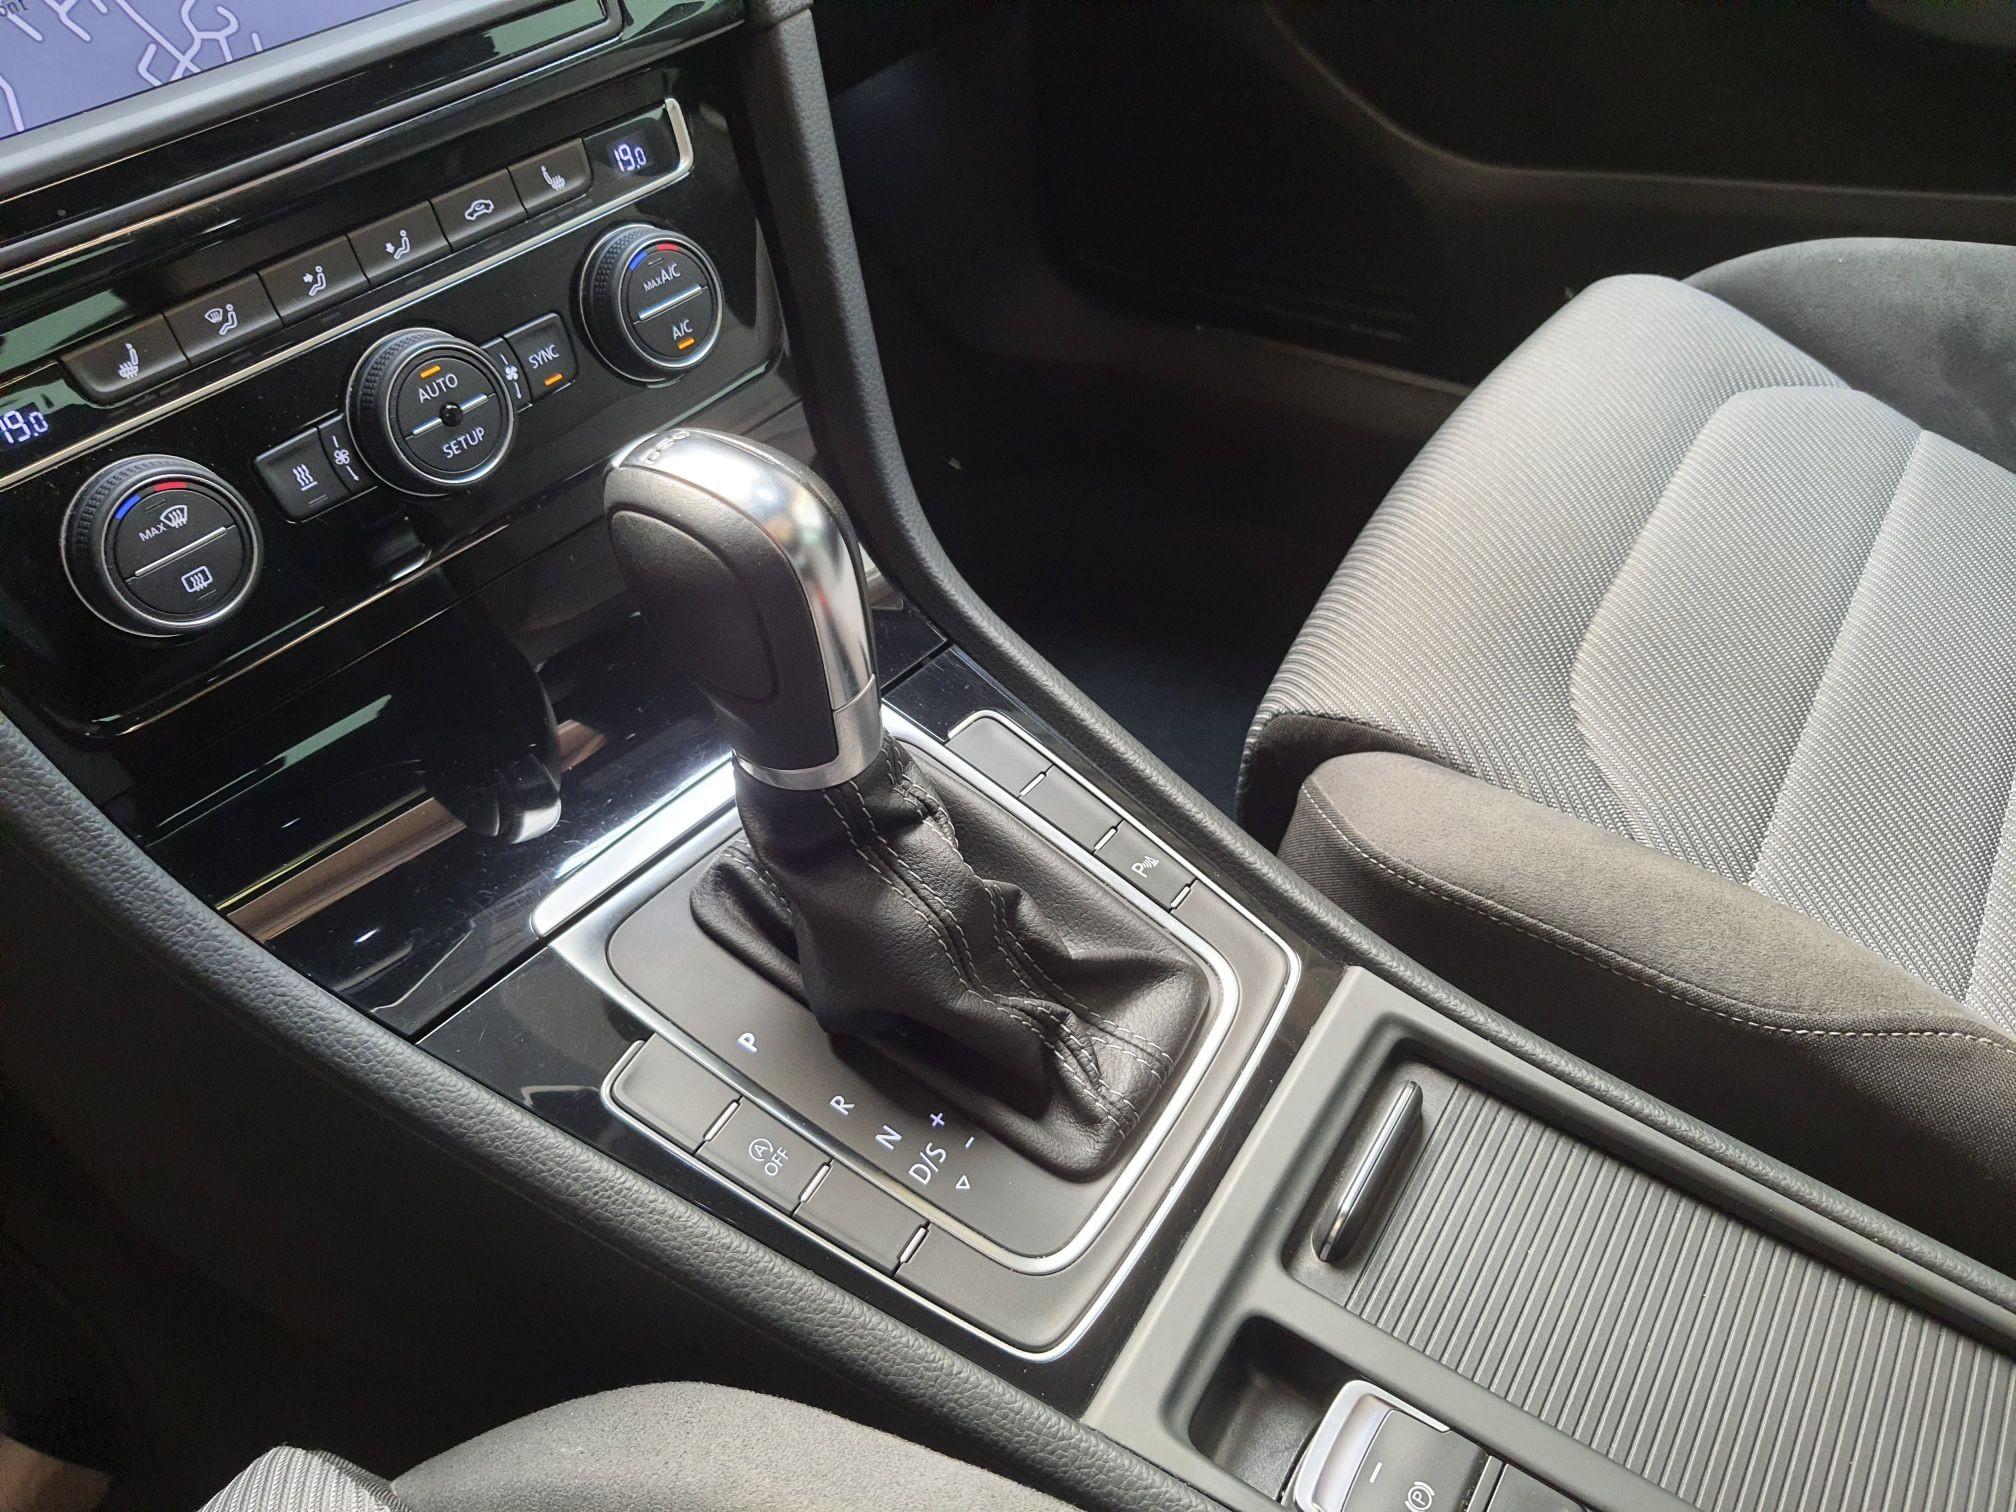 VW GOLF 7 RLINE DSG